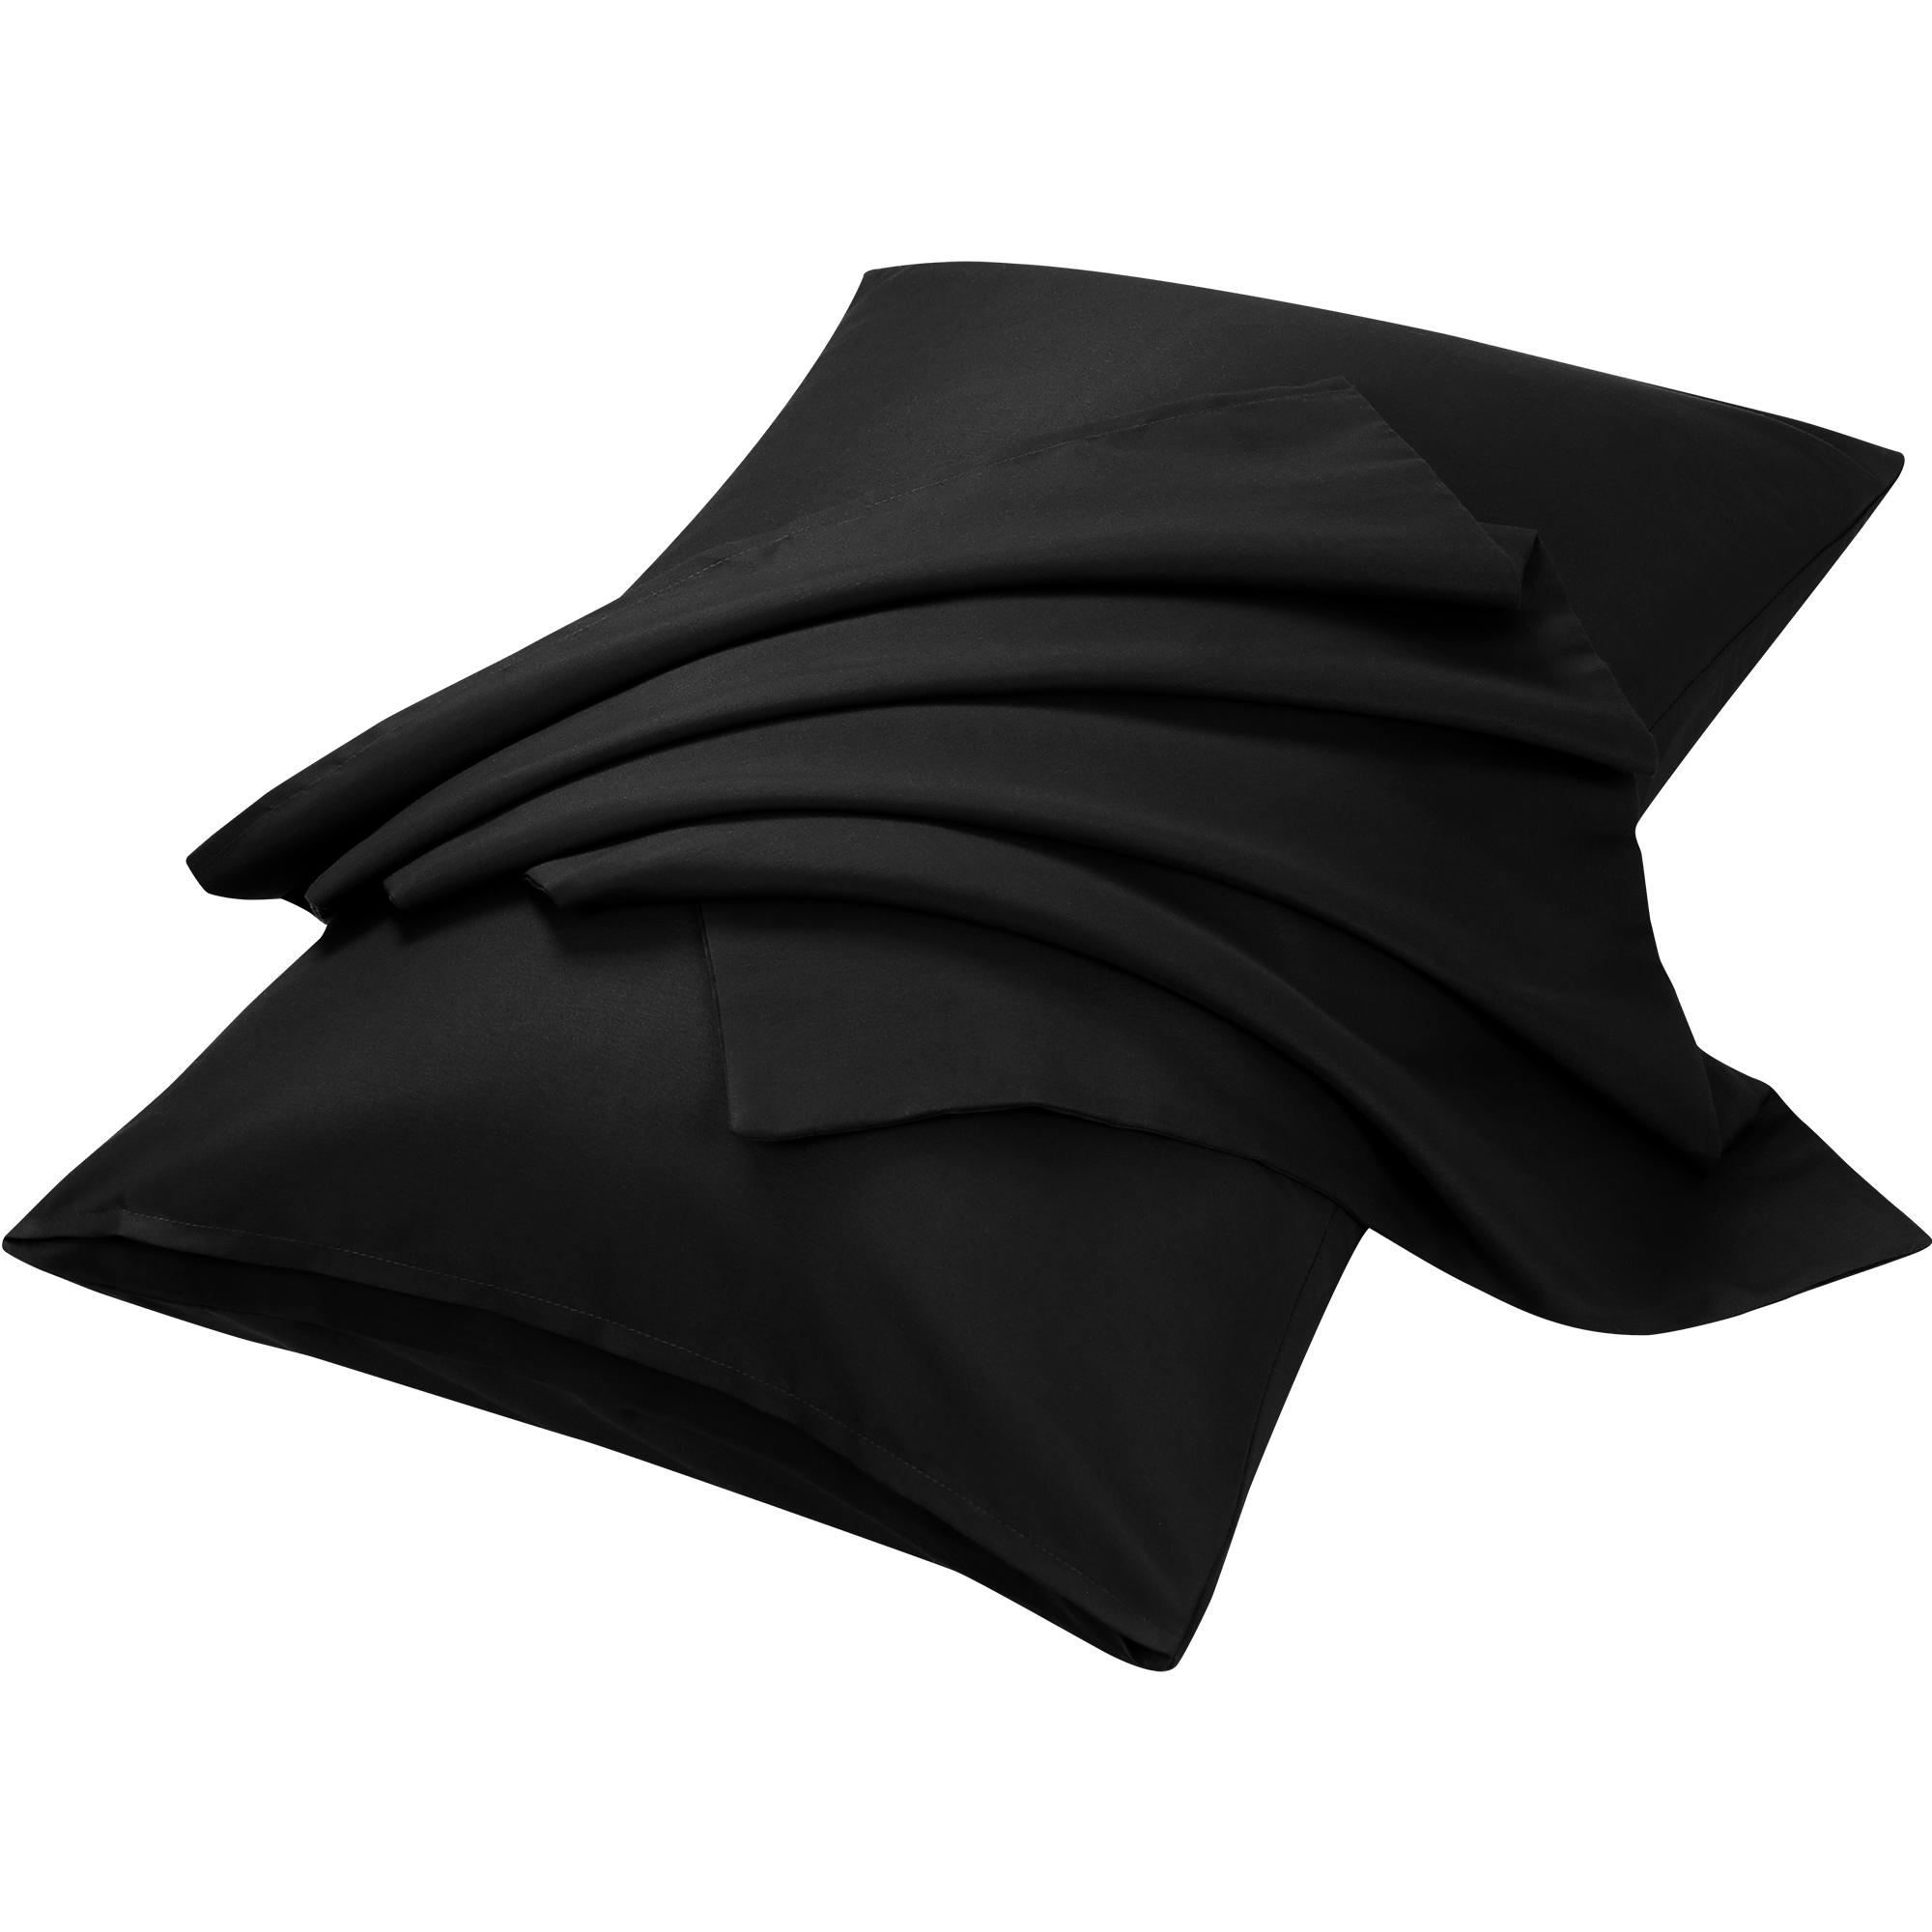 "2pcs Pillowcases Soft Microfiber, No Wrinkle, Black Travel (14"" x 20"")"